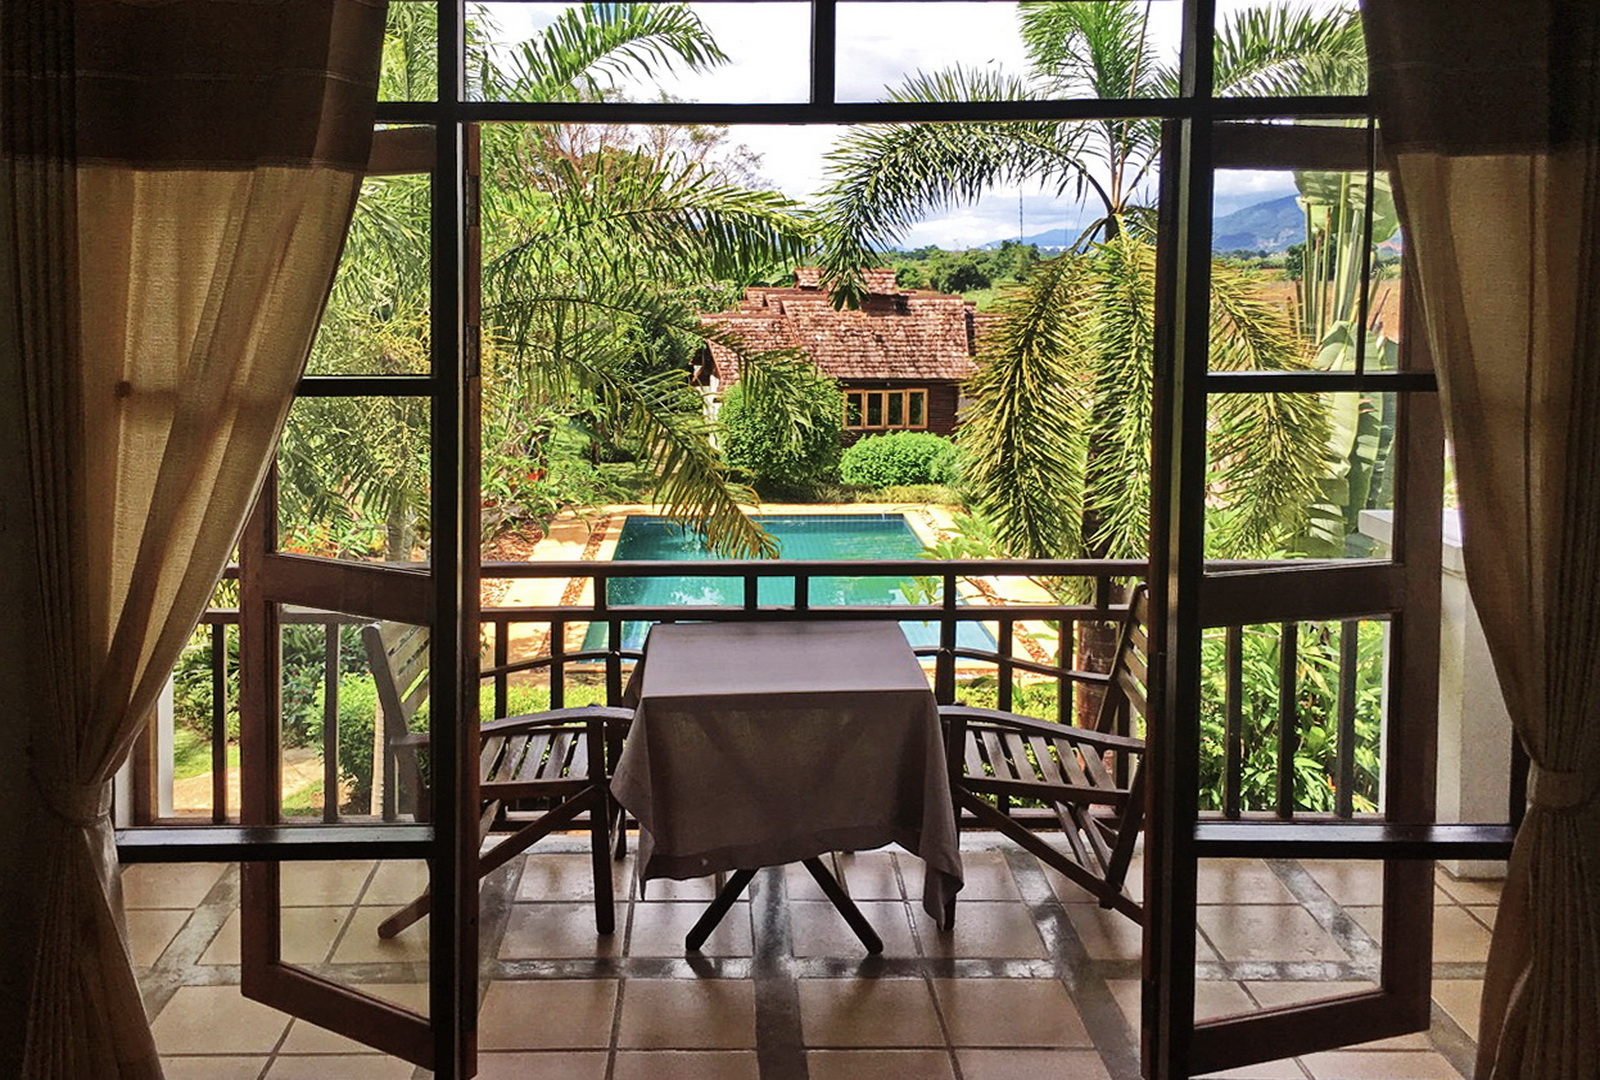 Thailand, Gin's Maekhong View Resort